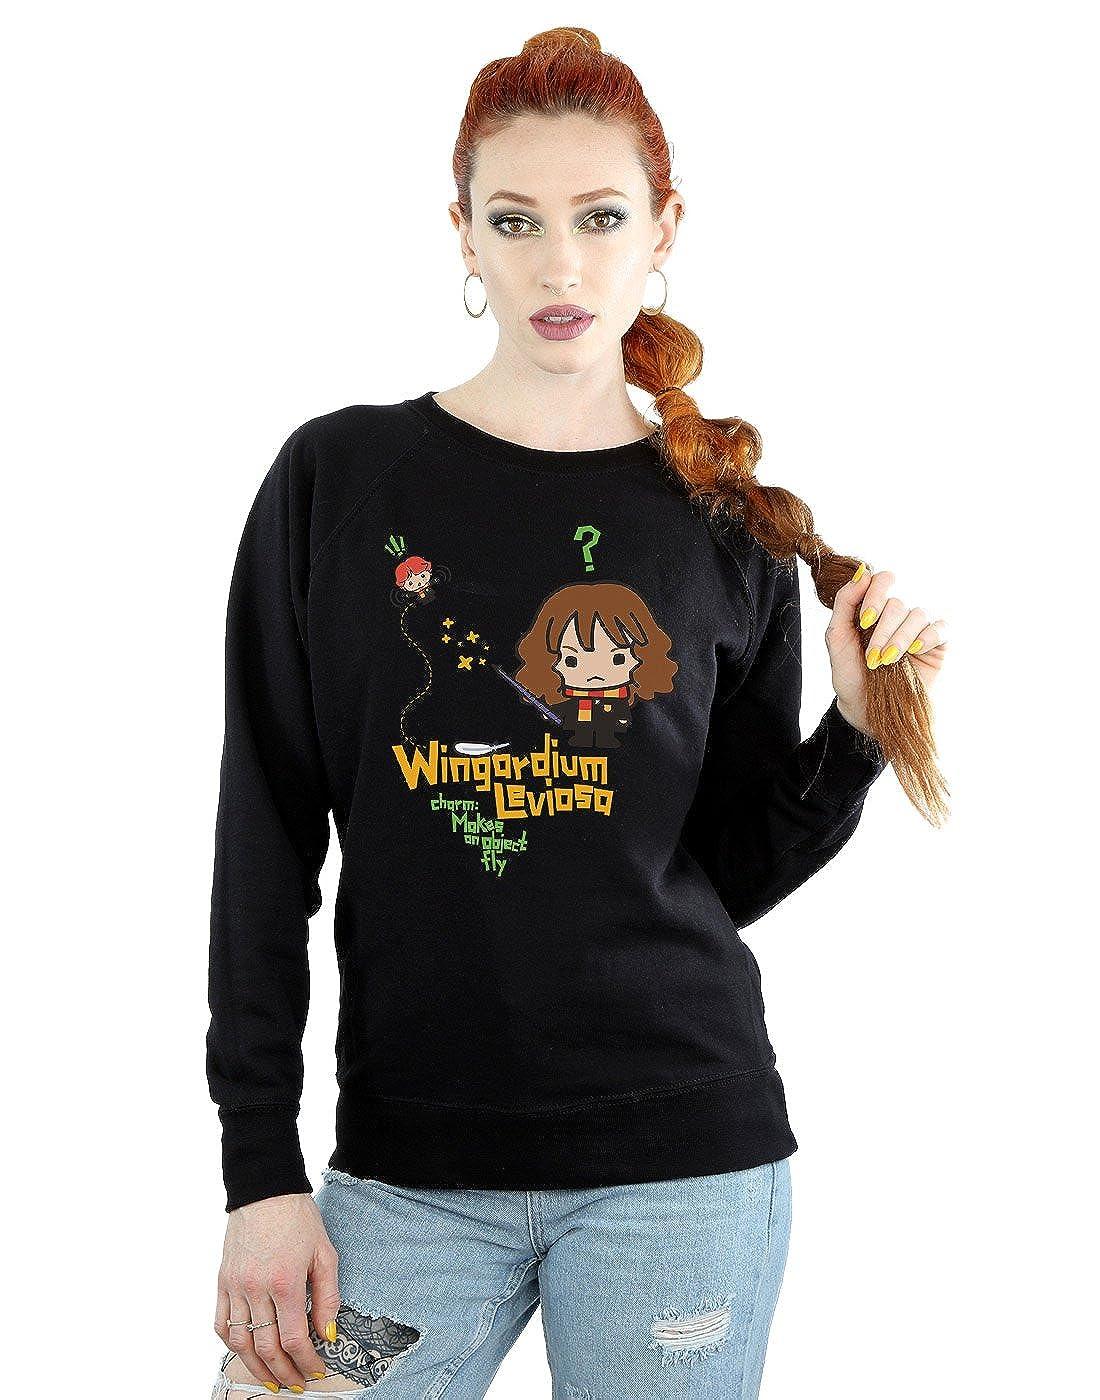 HARRY POTTER Mujer Hermione Granger Wingardium Leviosa Junior Camisa De Entrenamiento